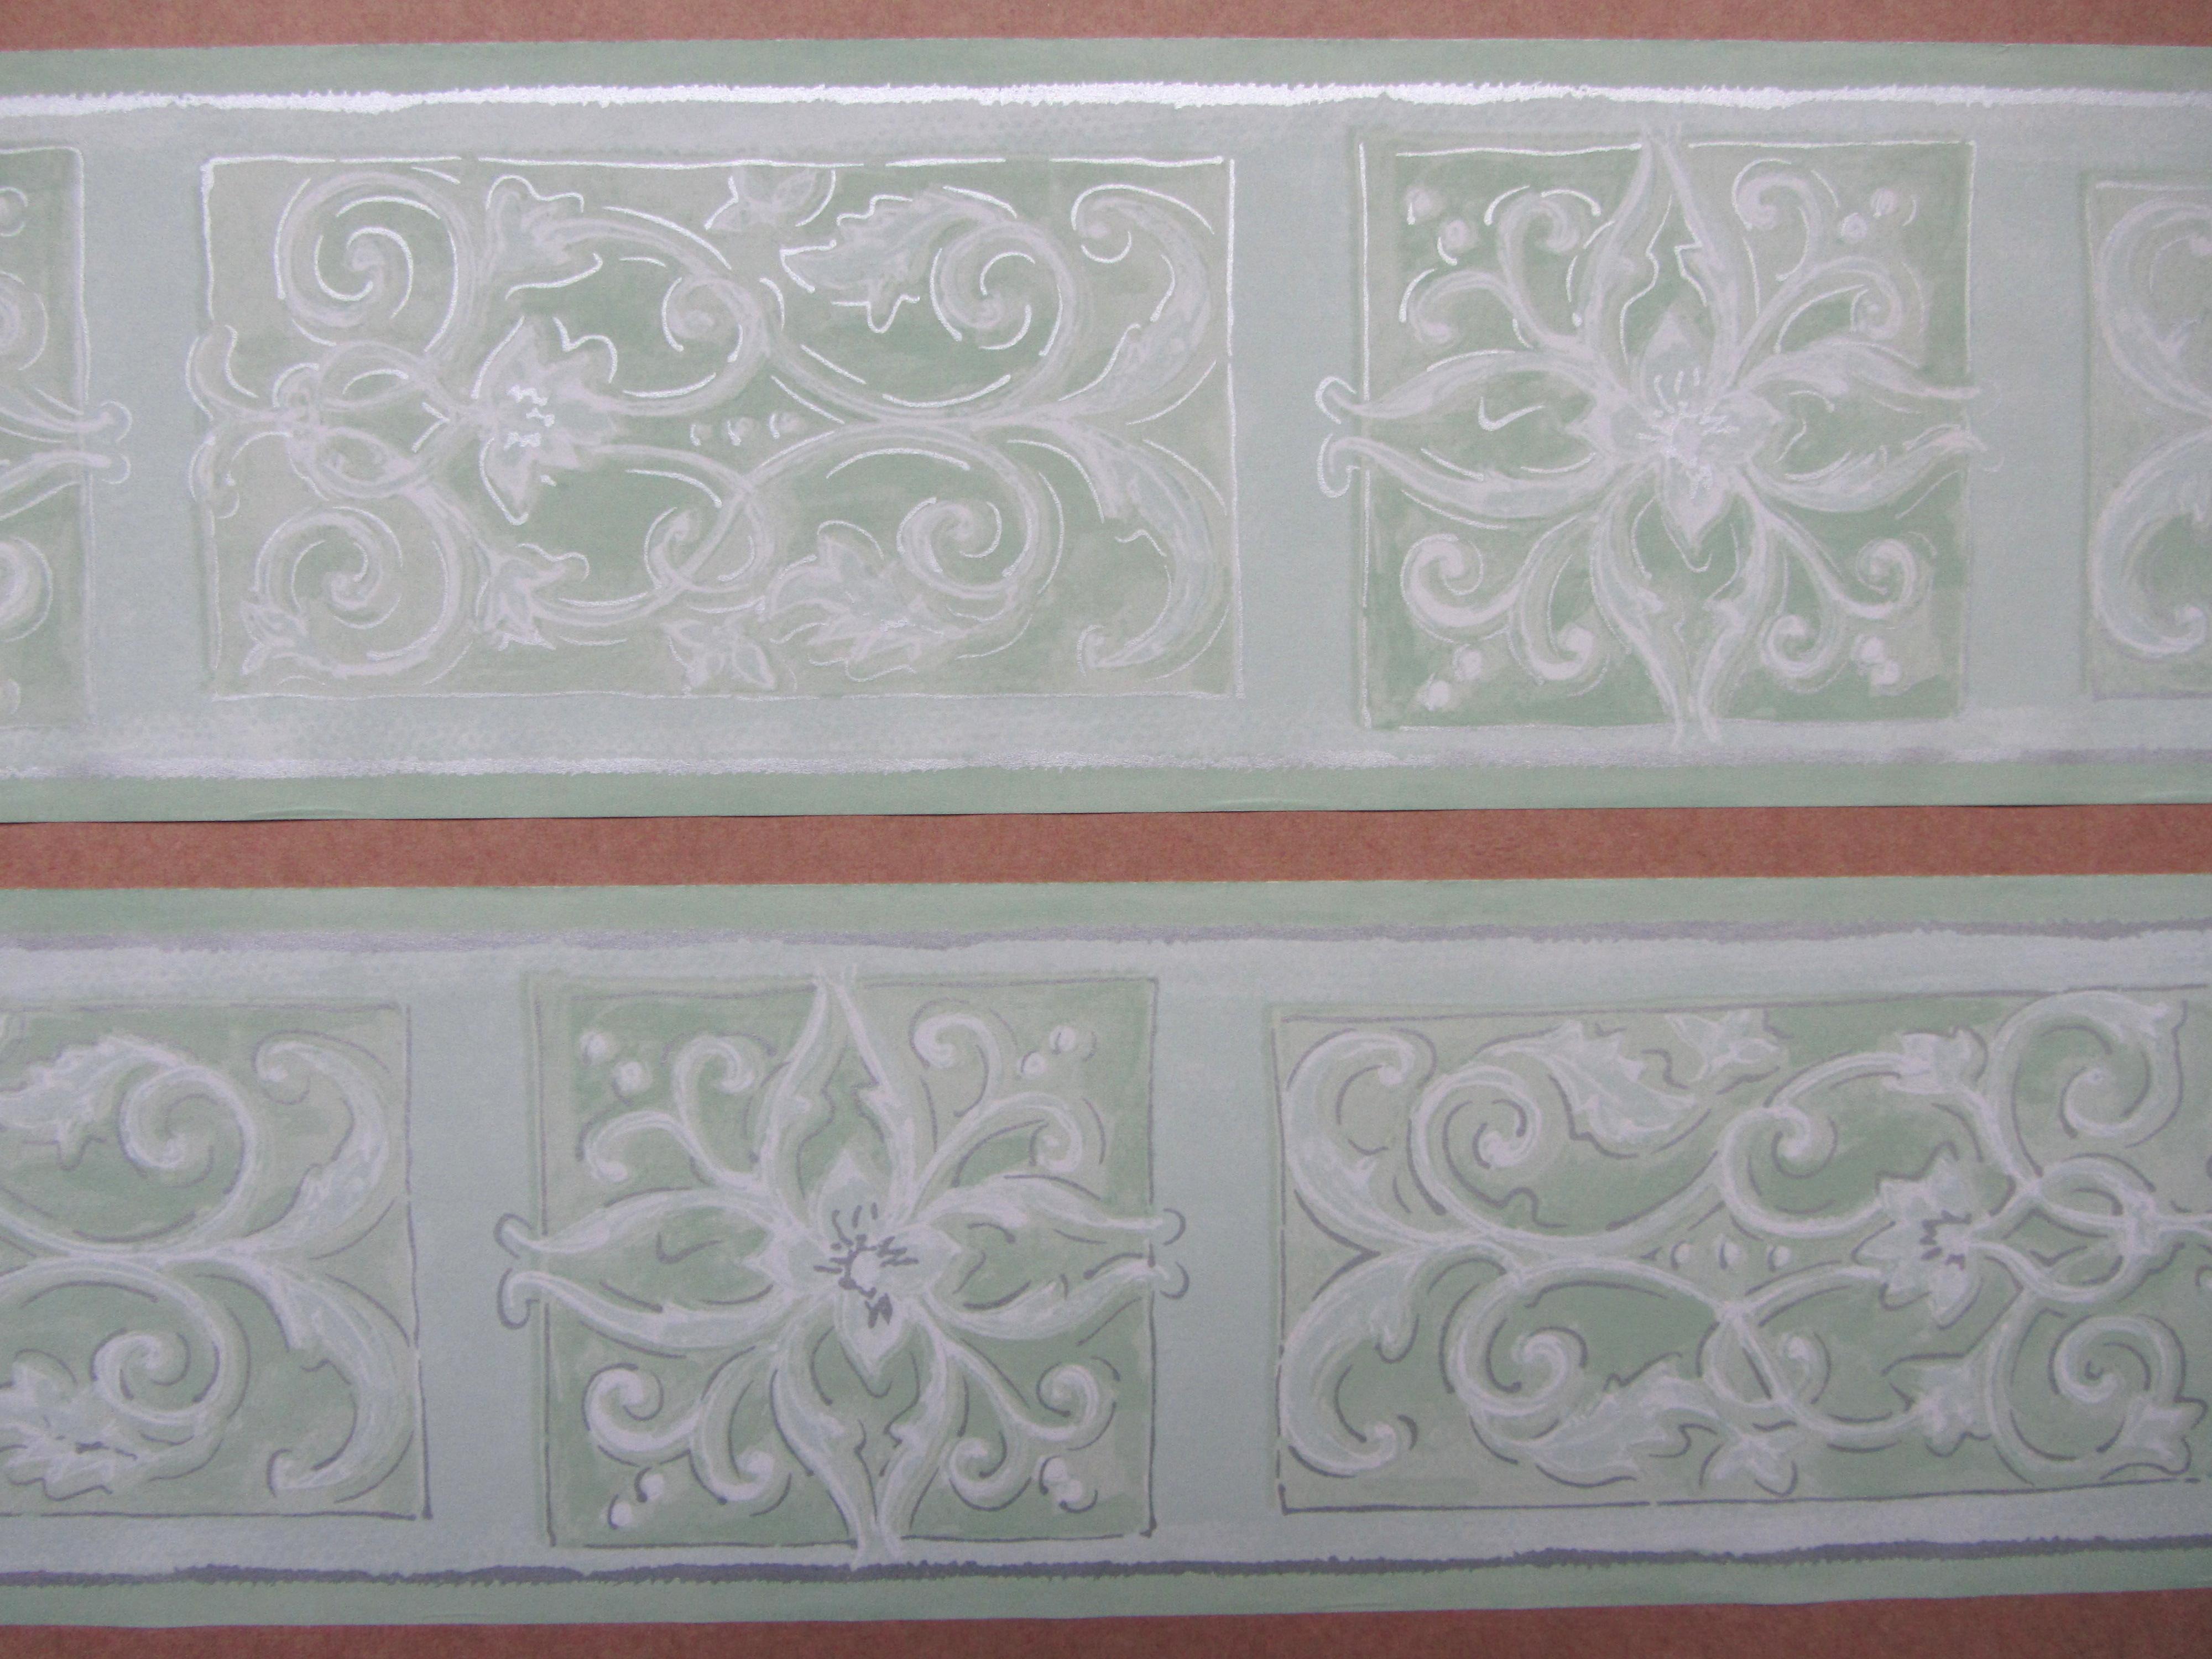 50+] Border Wallpaper for Bedroom on WallpaperSafari